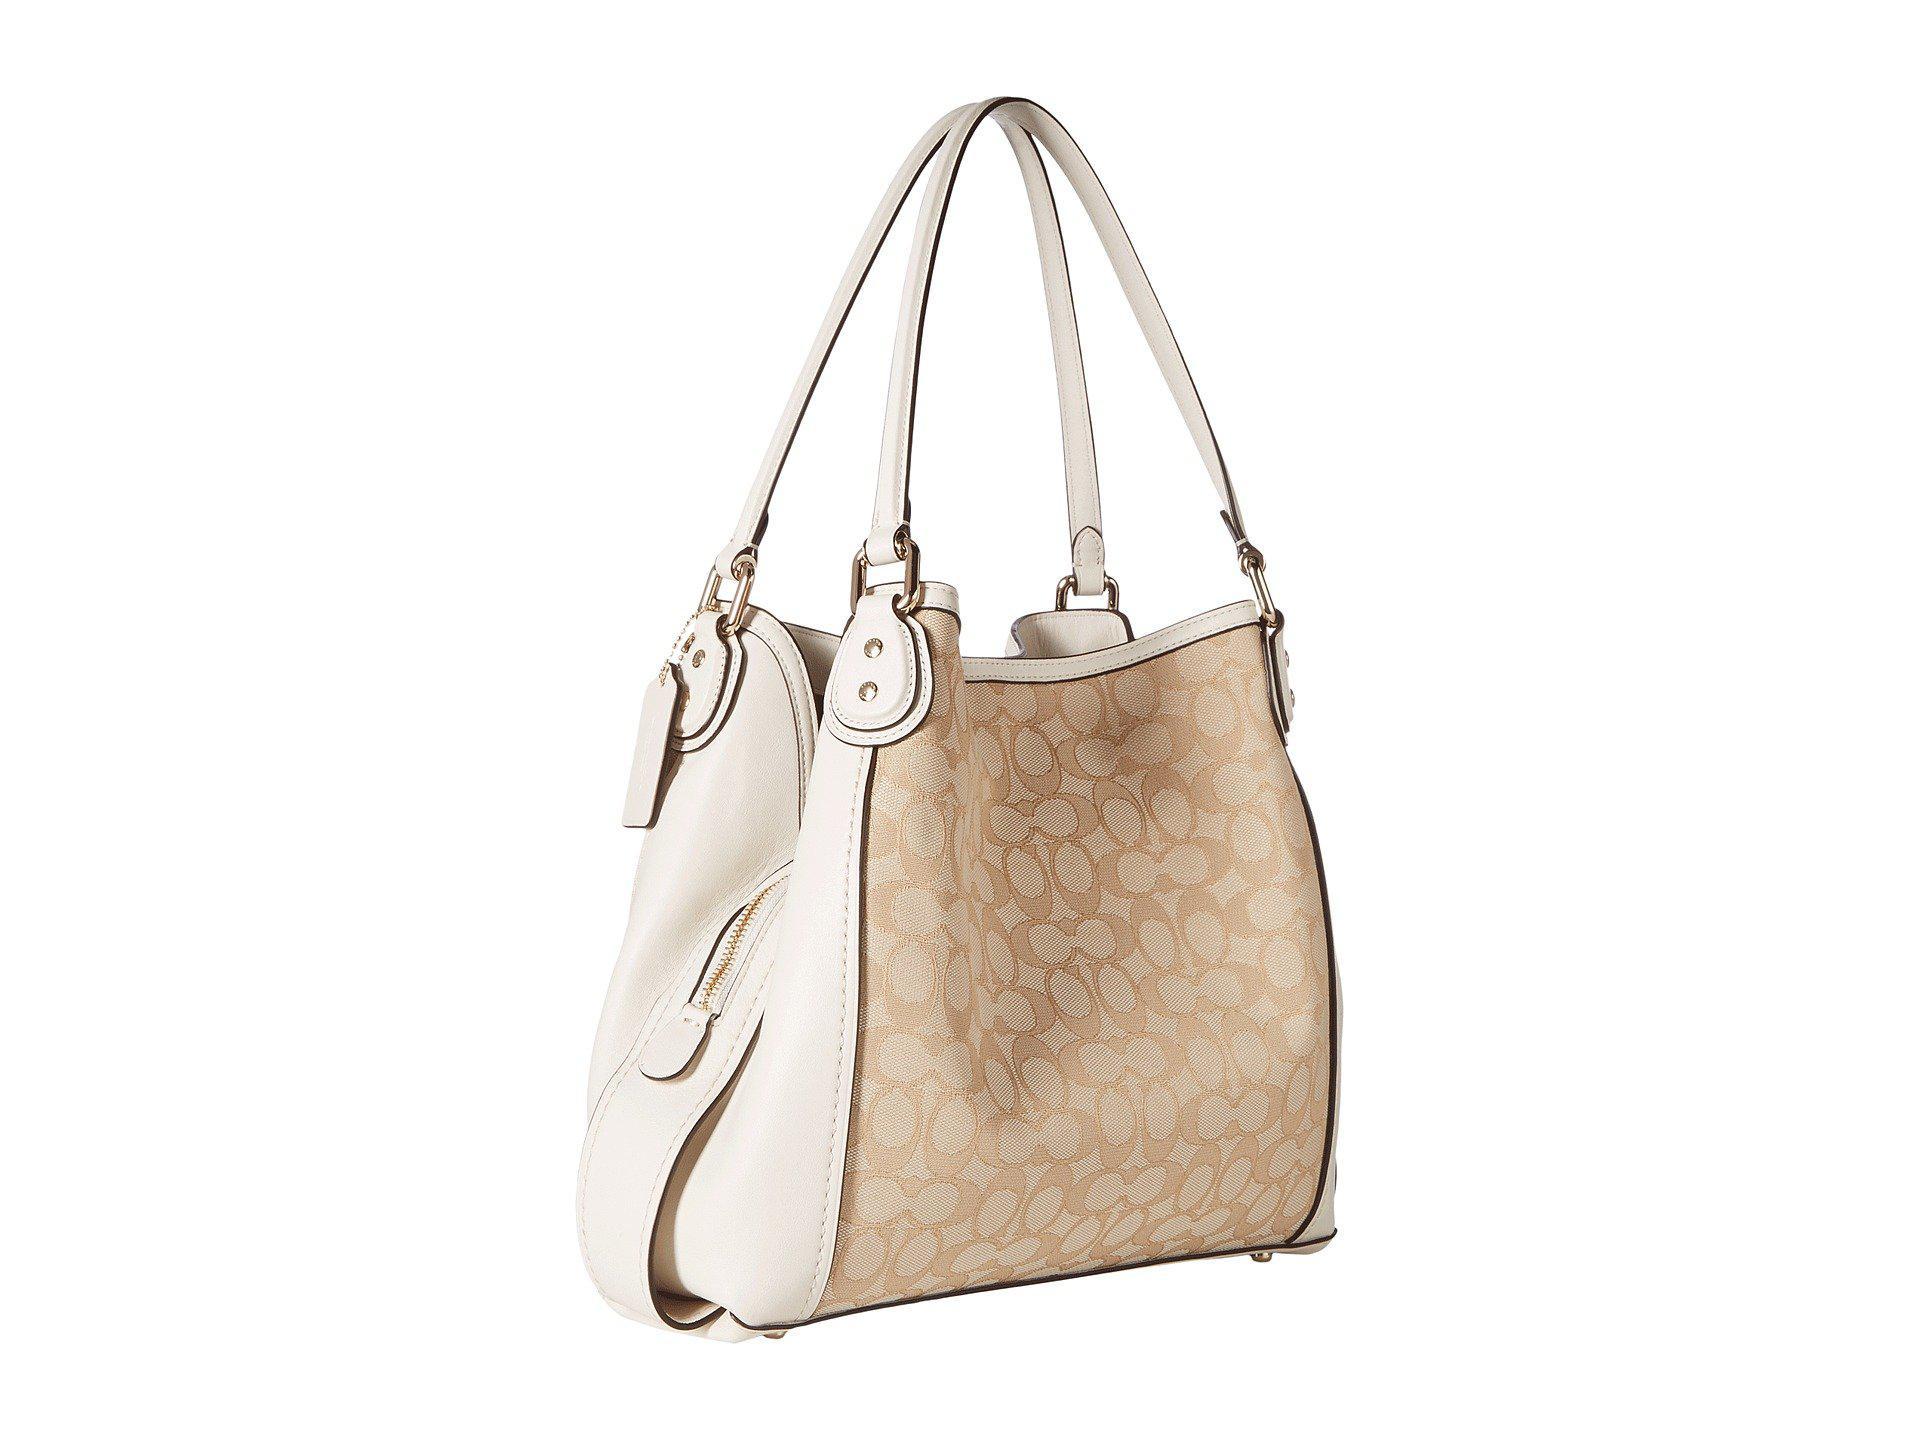 0003a2ff57 COACH - Natural Signature Edie 31 Shoulder Bag (li khaki brown) Handbags.  View fullscreen